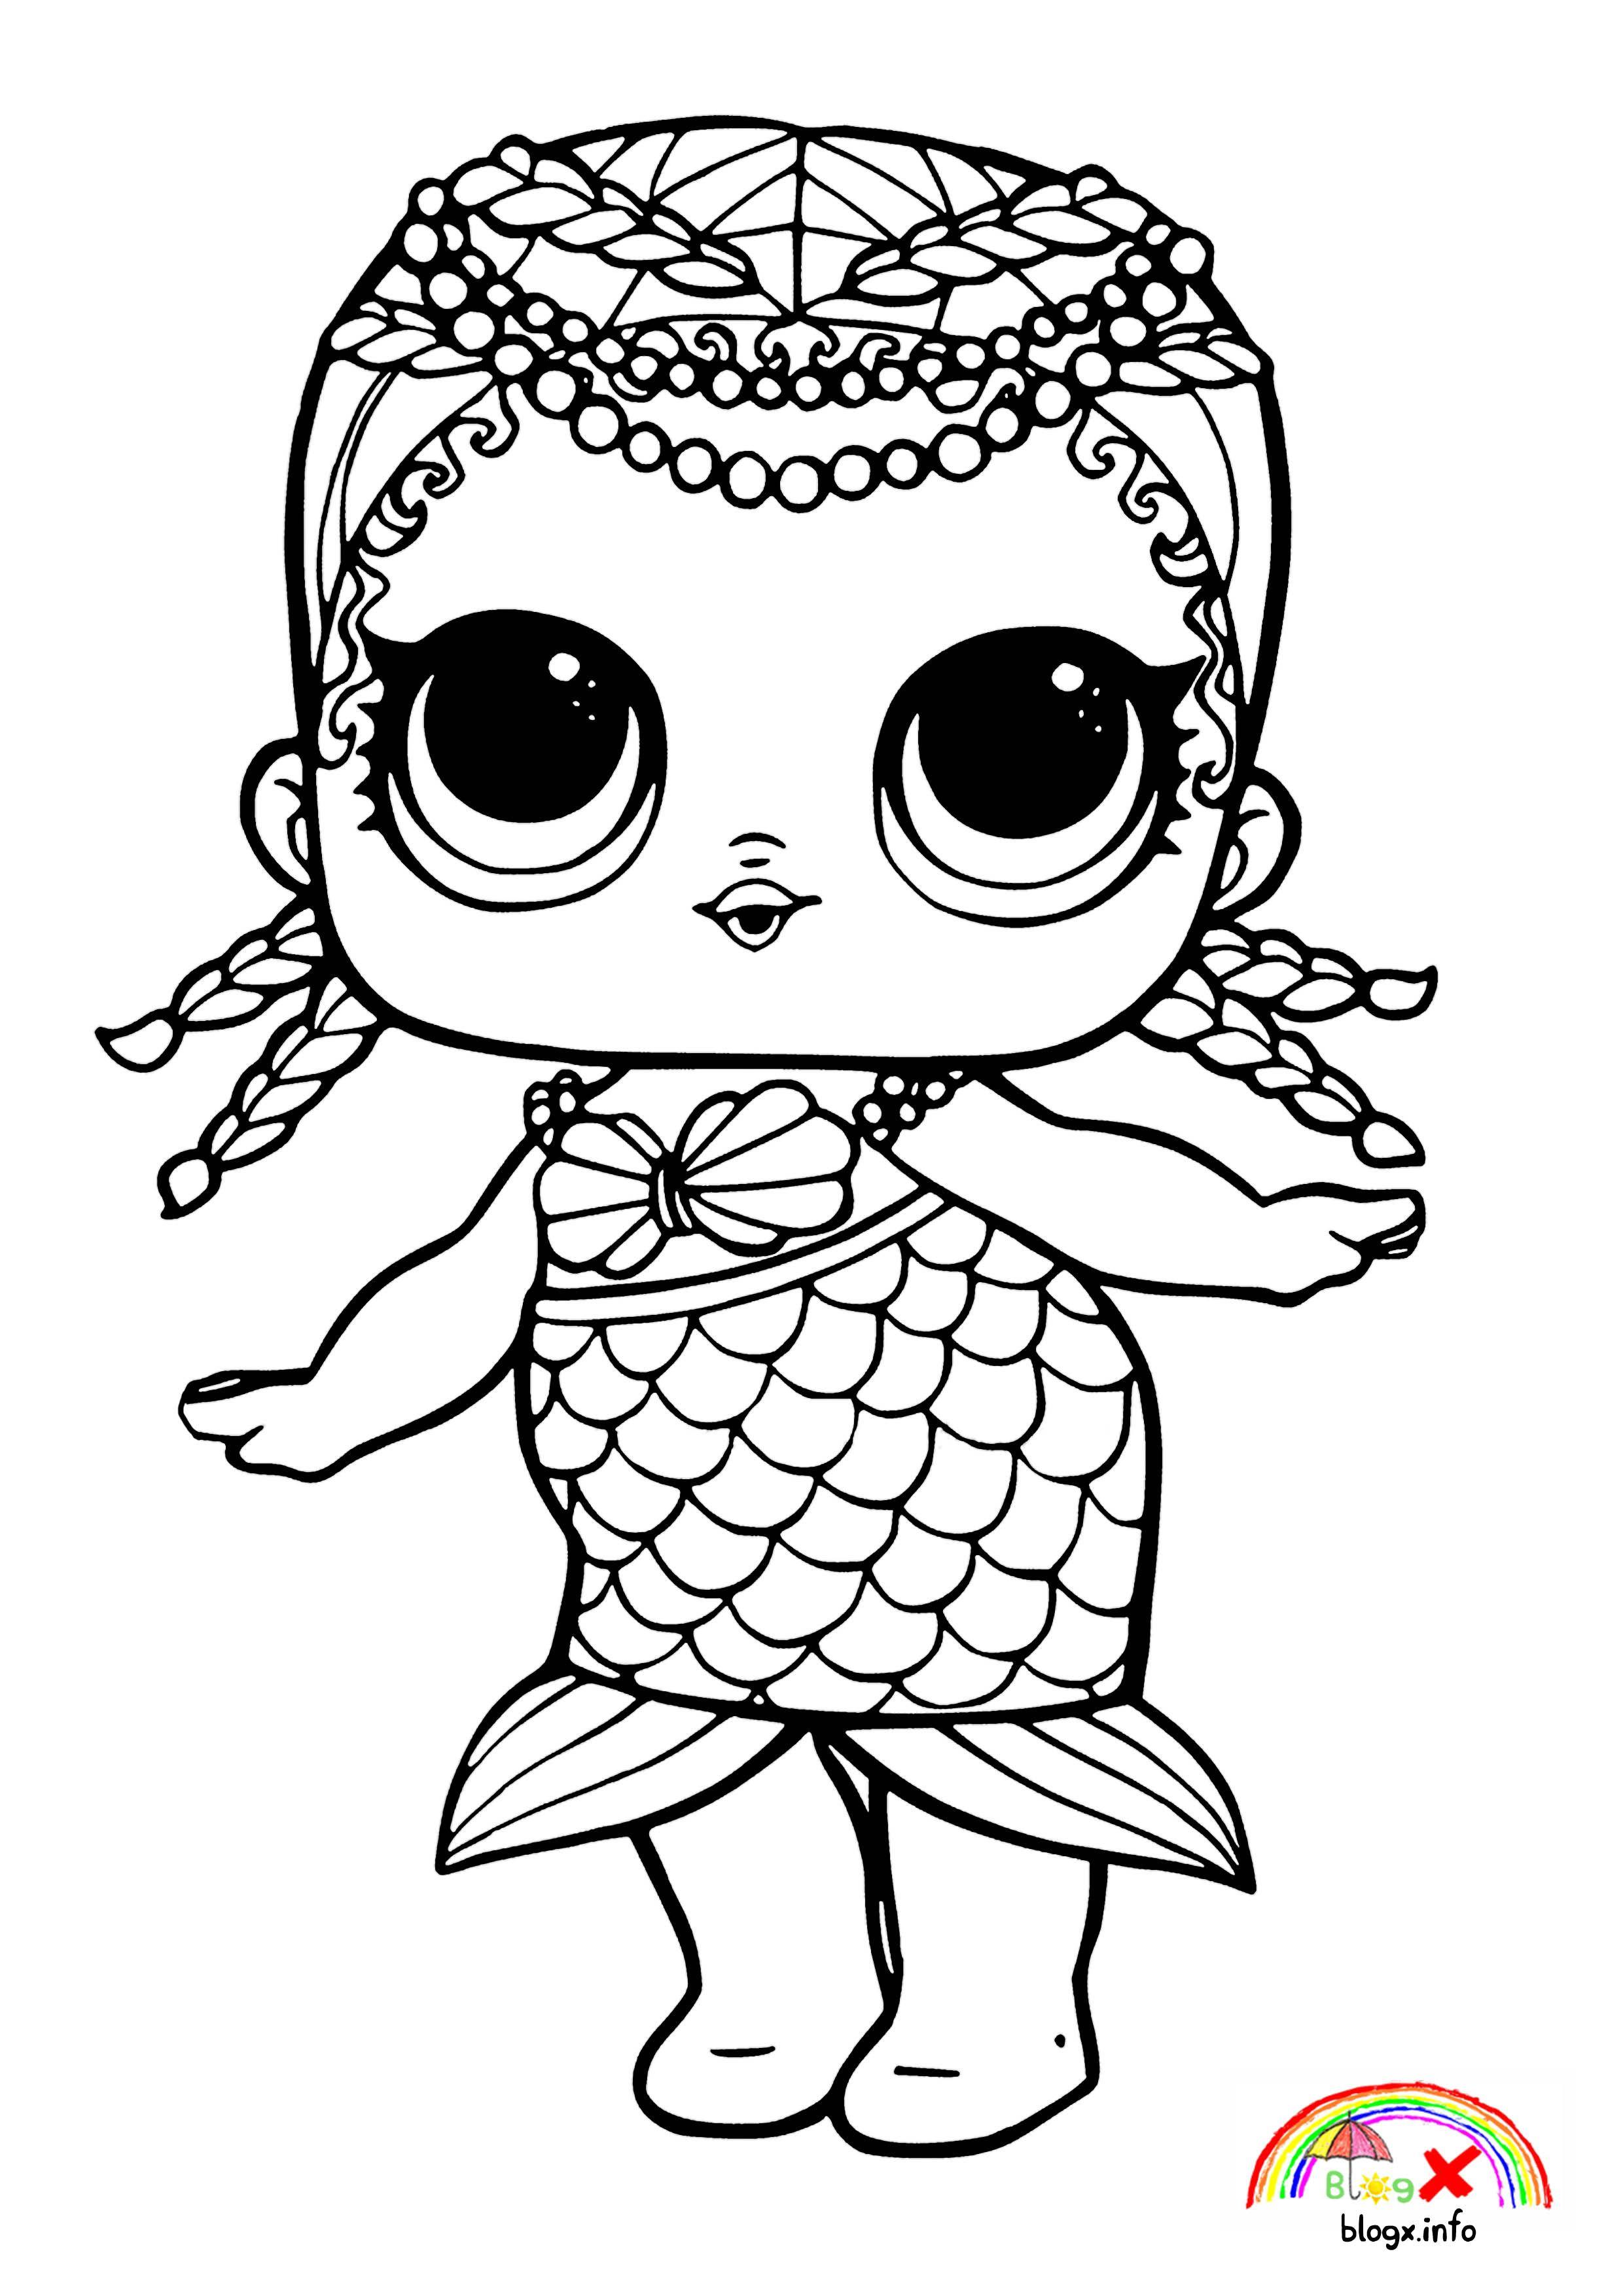 Lol Dolls Mermaid Series Coloring Page Unicorn Coloring Pages Mermaid Coloring Pages Mermaid Coloring